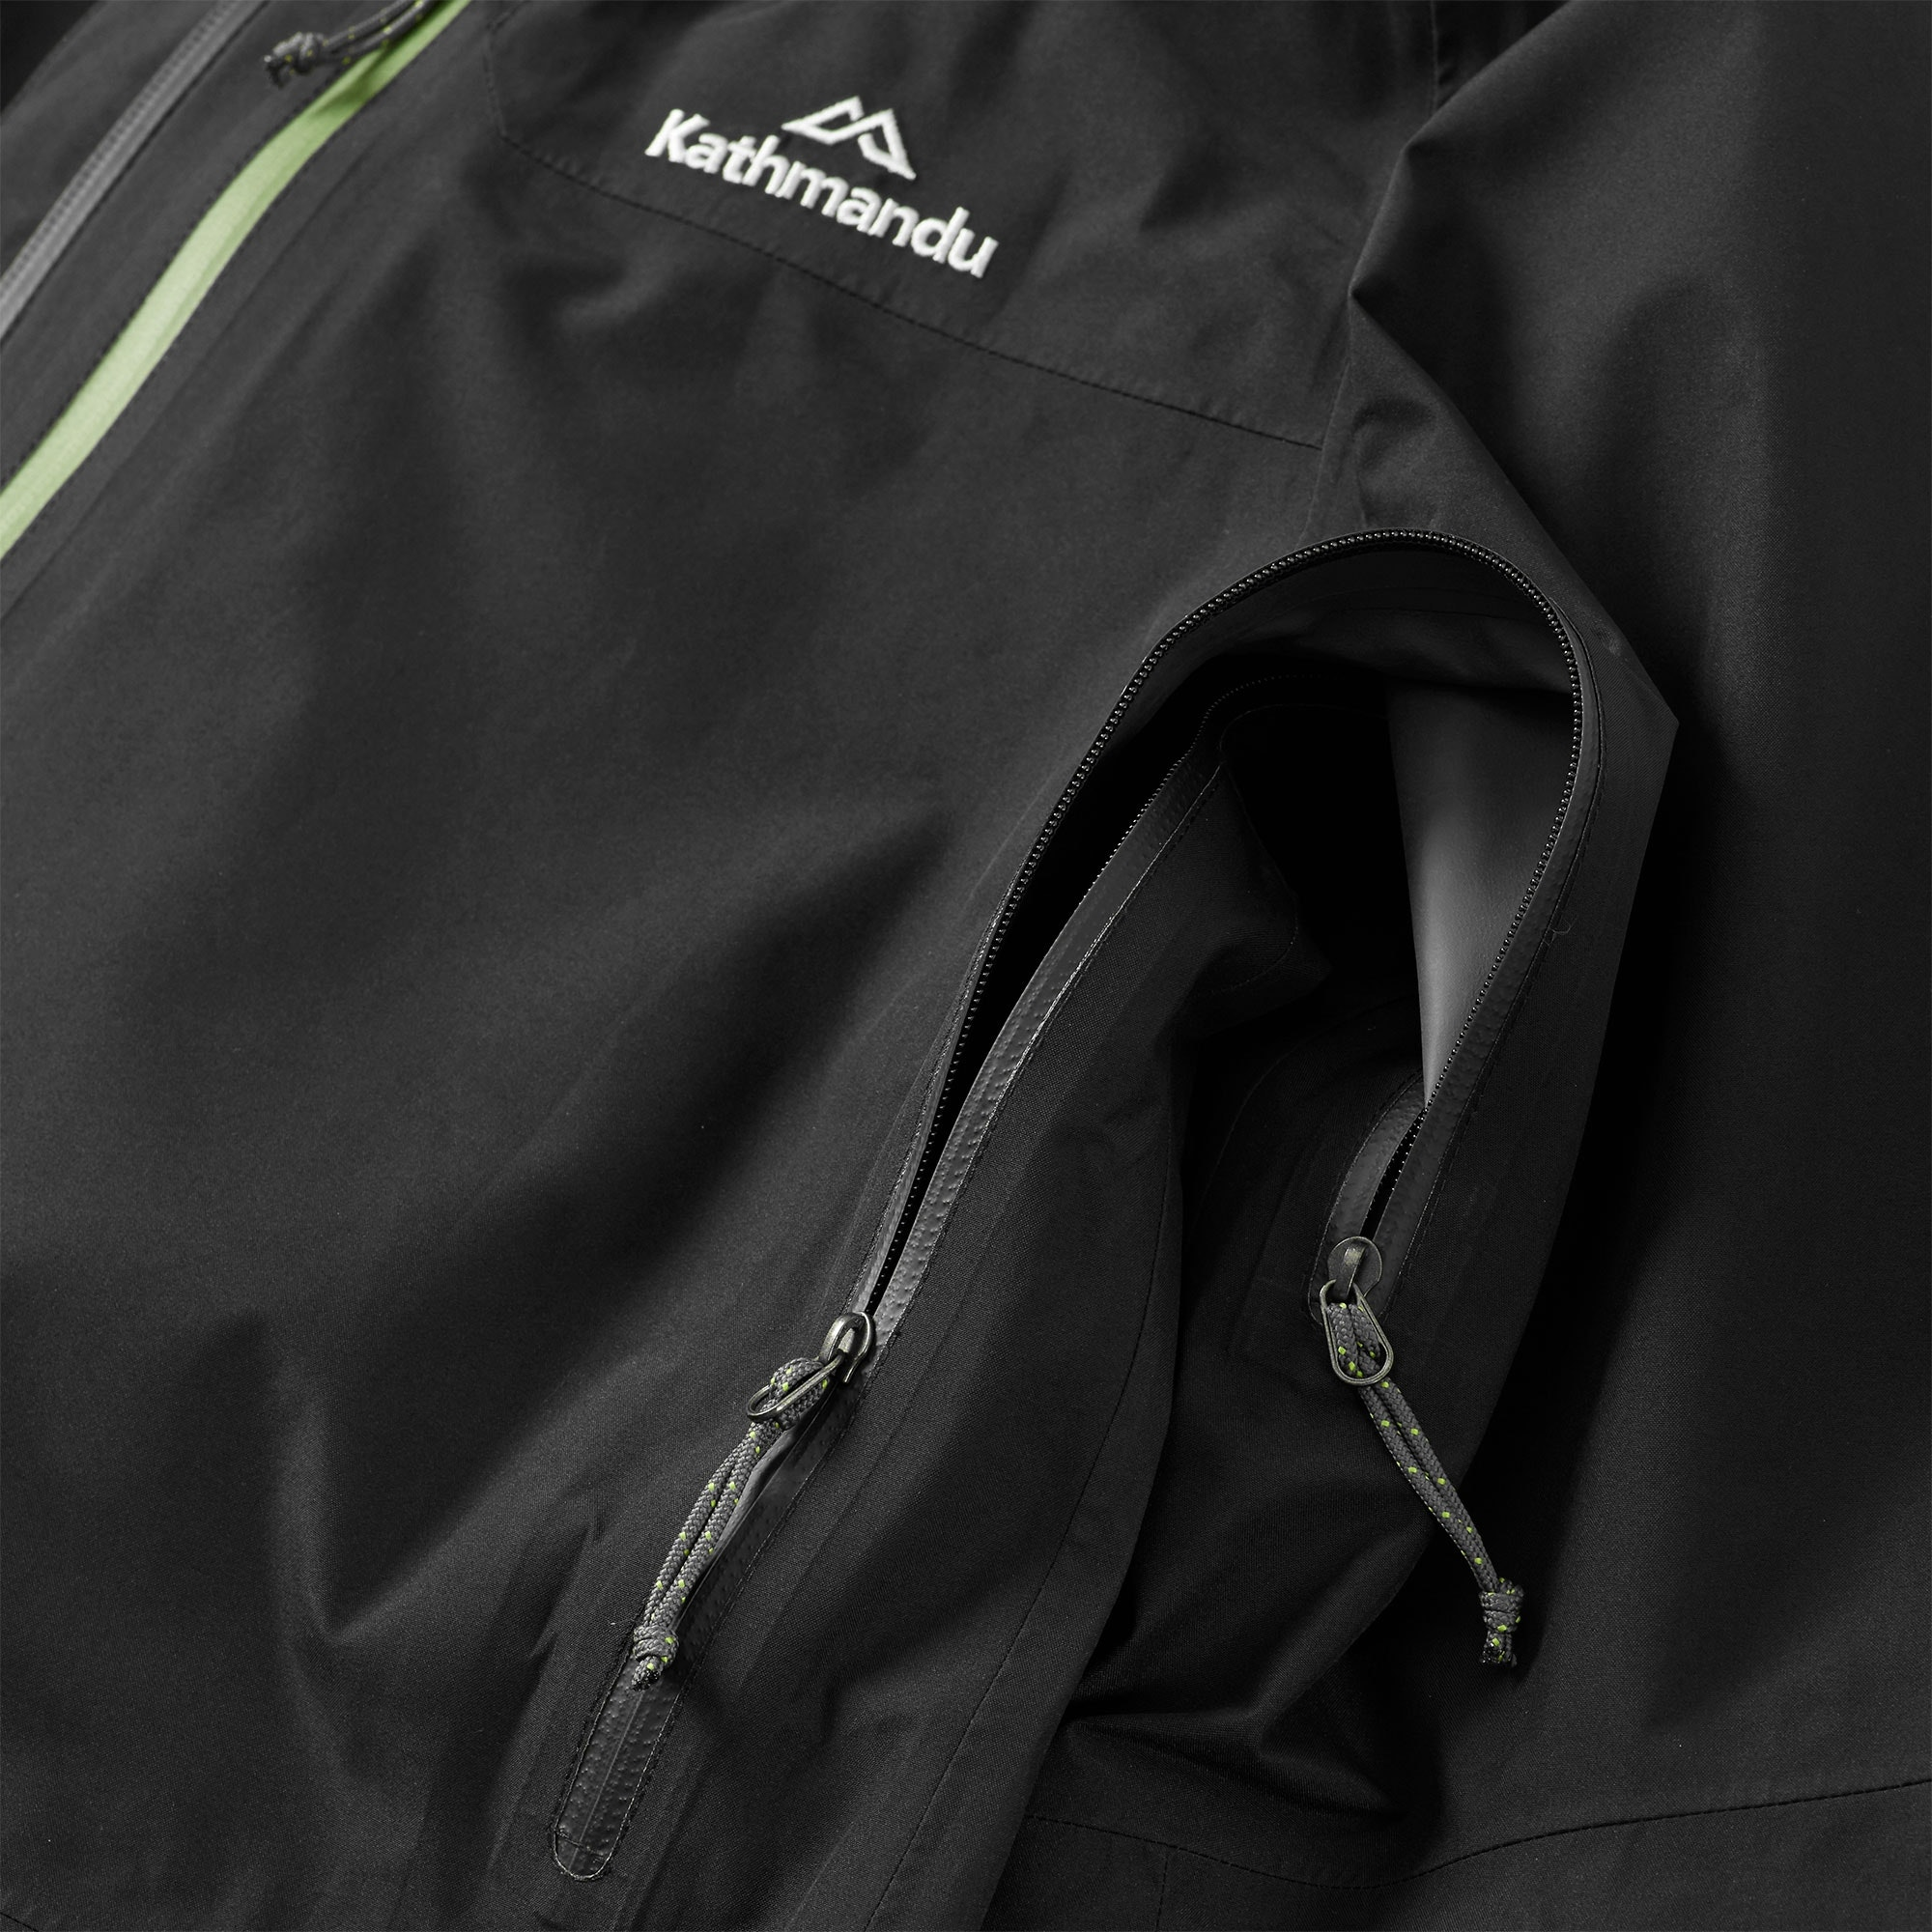 NEW-Kathmandu-Aysen-Men-039-s-GORE-TEX-Windproof-Waterproof-Outdoor-Rain-Jacket thumbnail 6